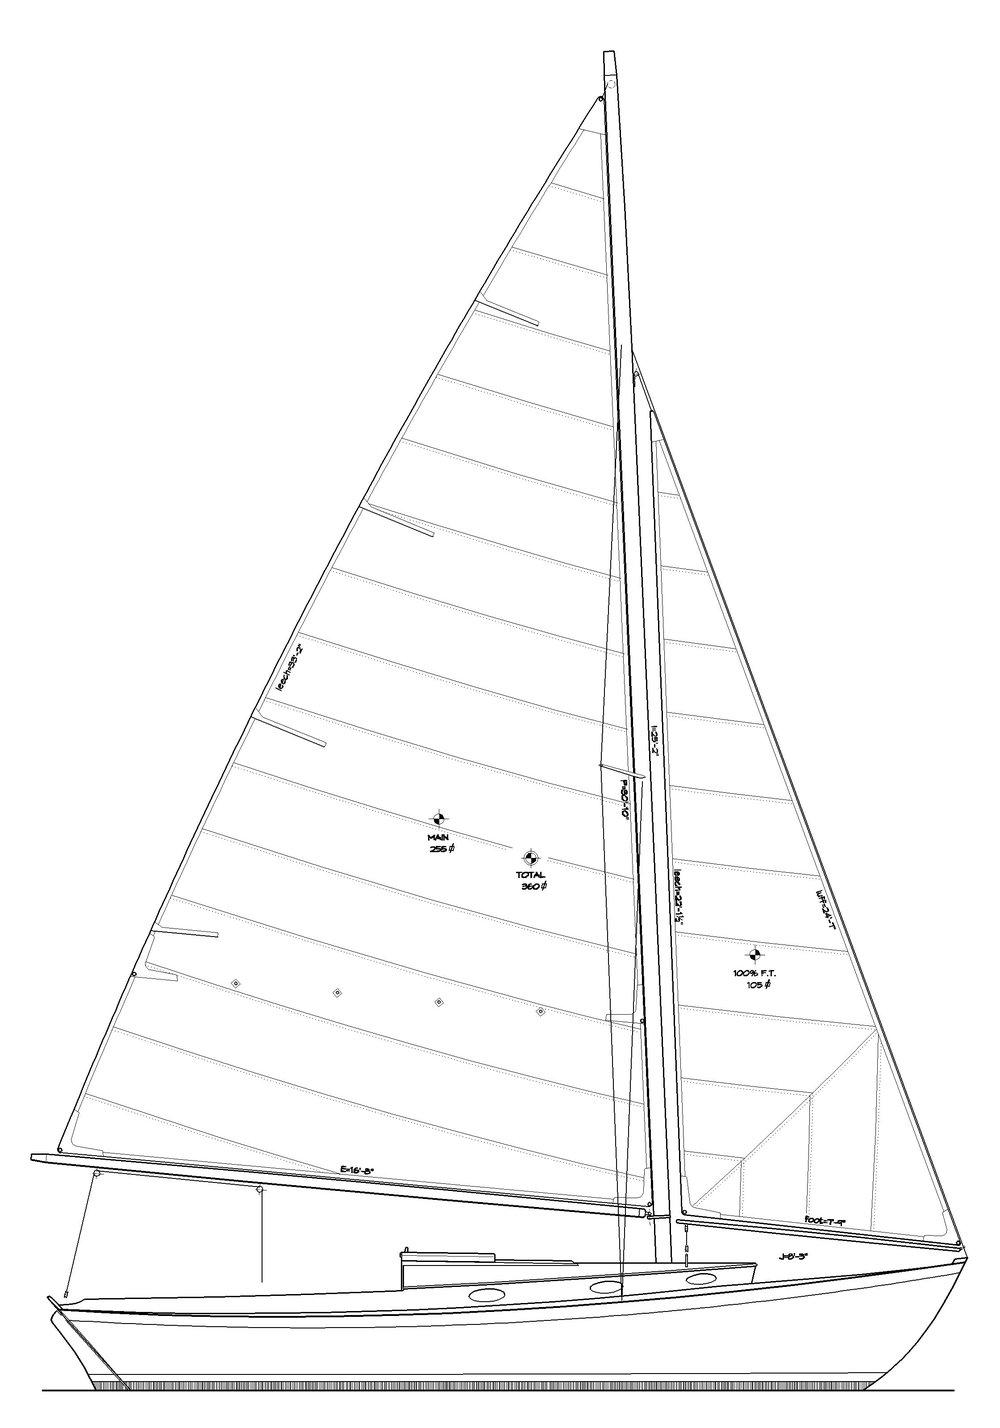 payor_17_sail_plan.png